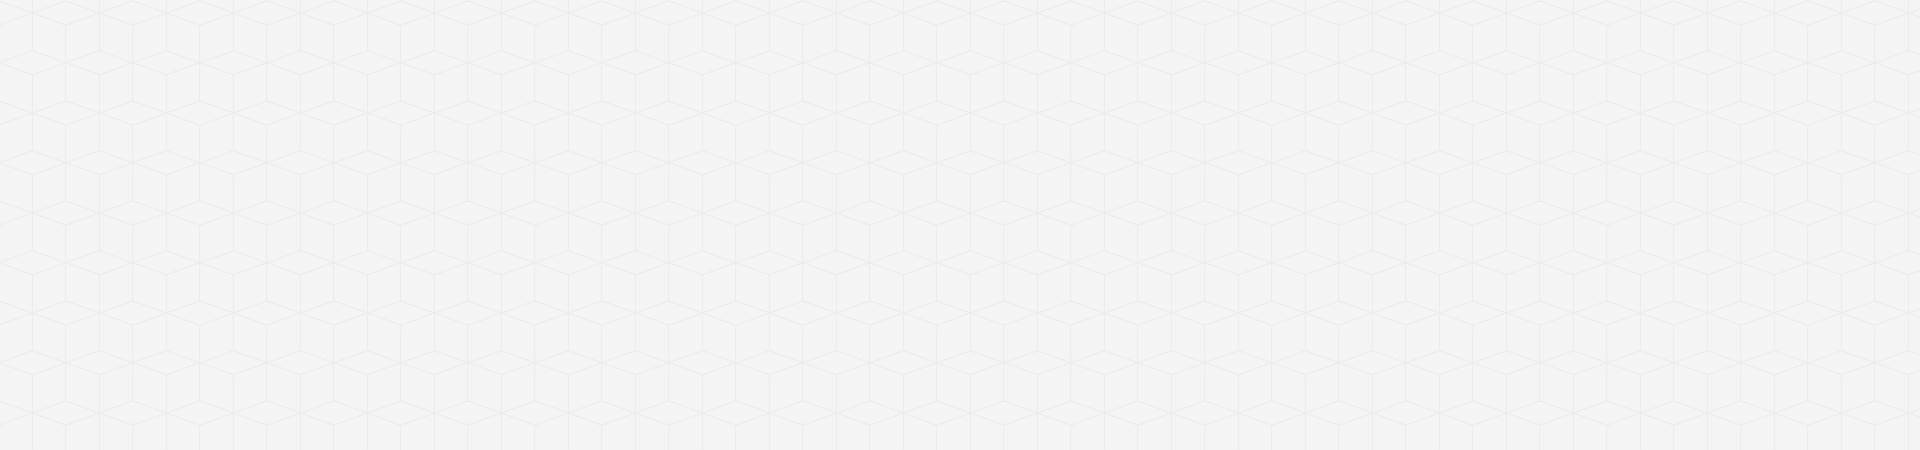 ff_rev_slider_bkg_PB_cubes